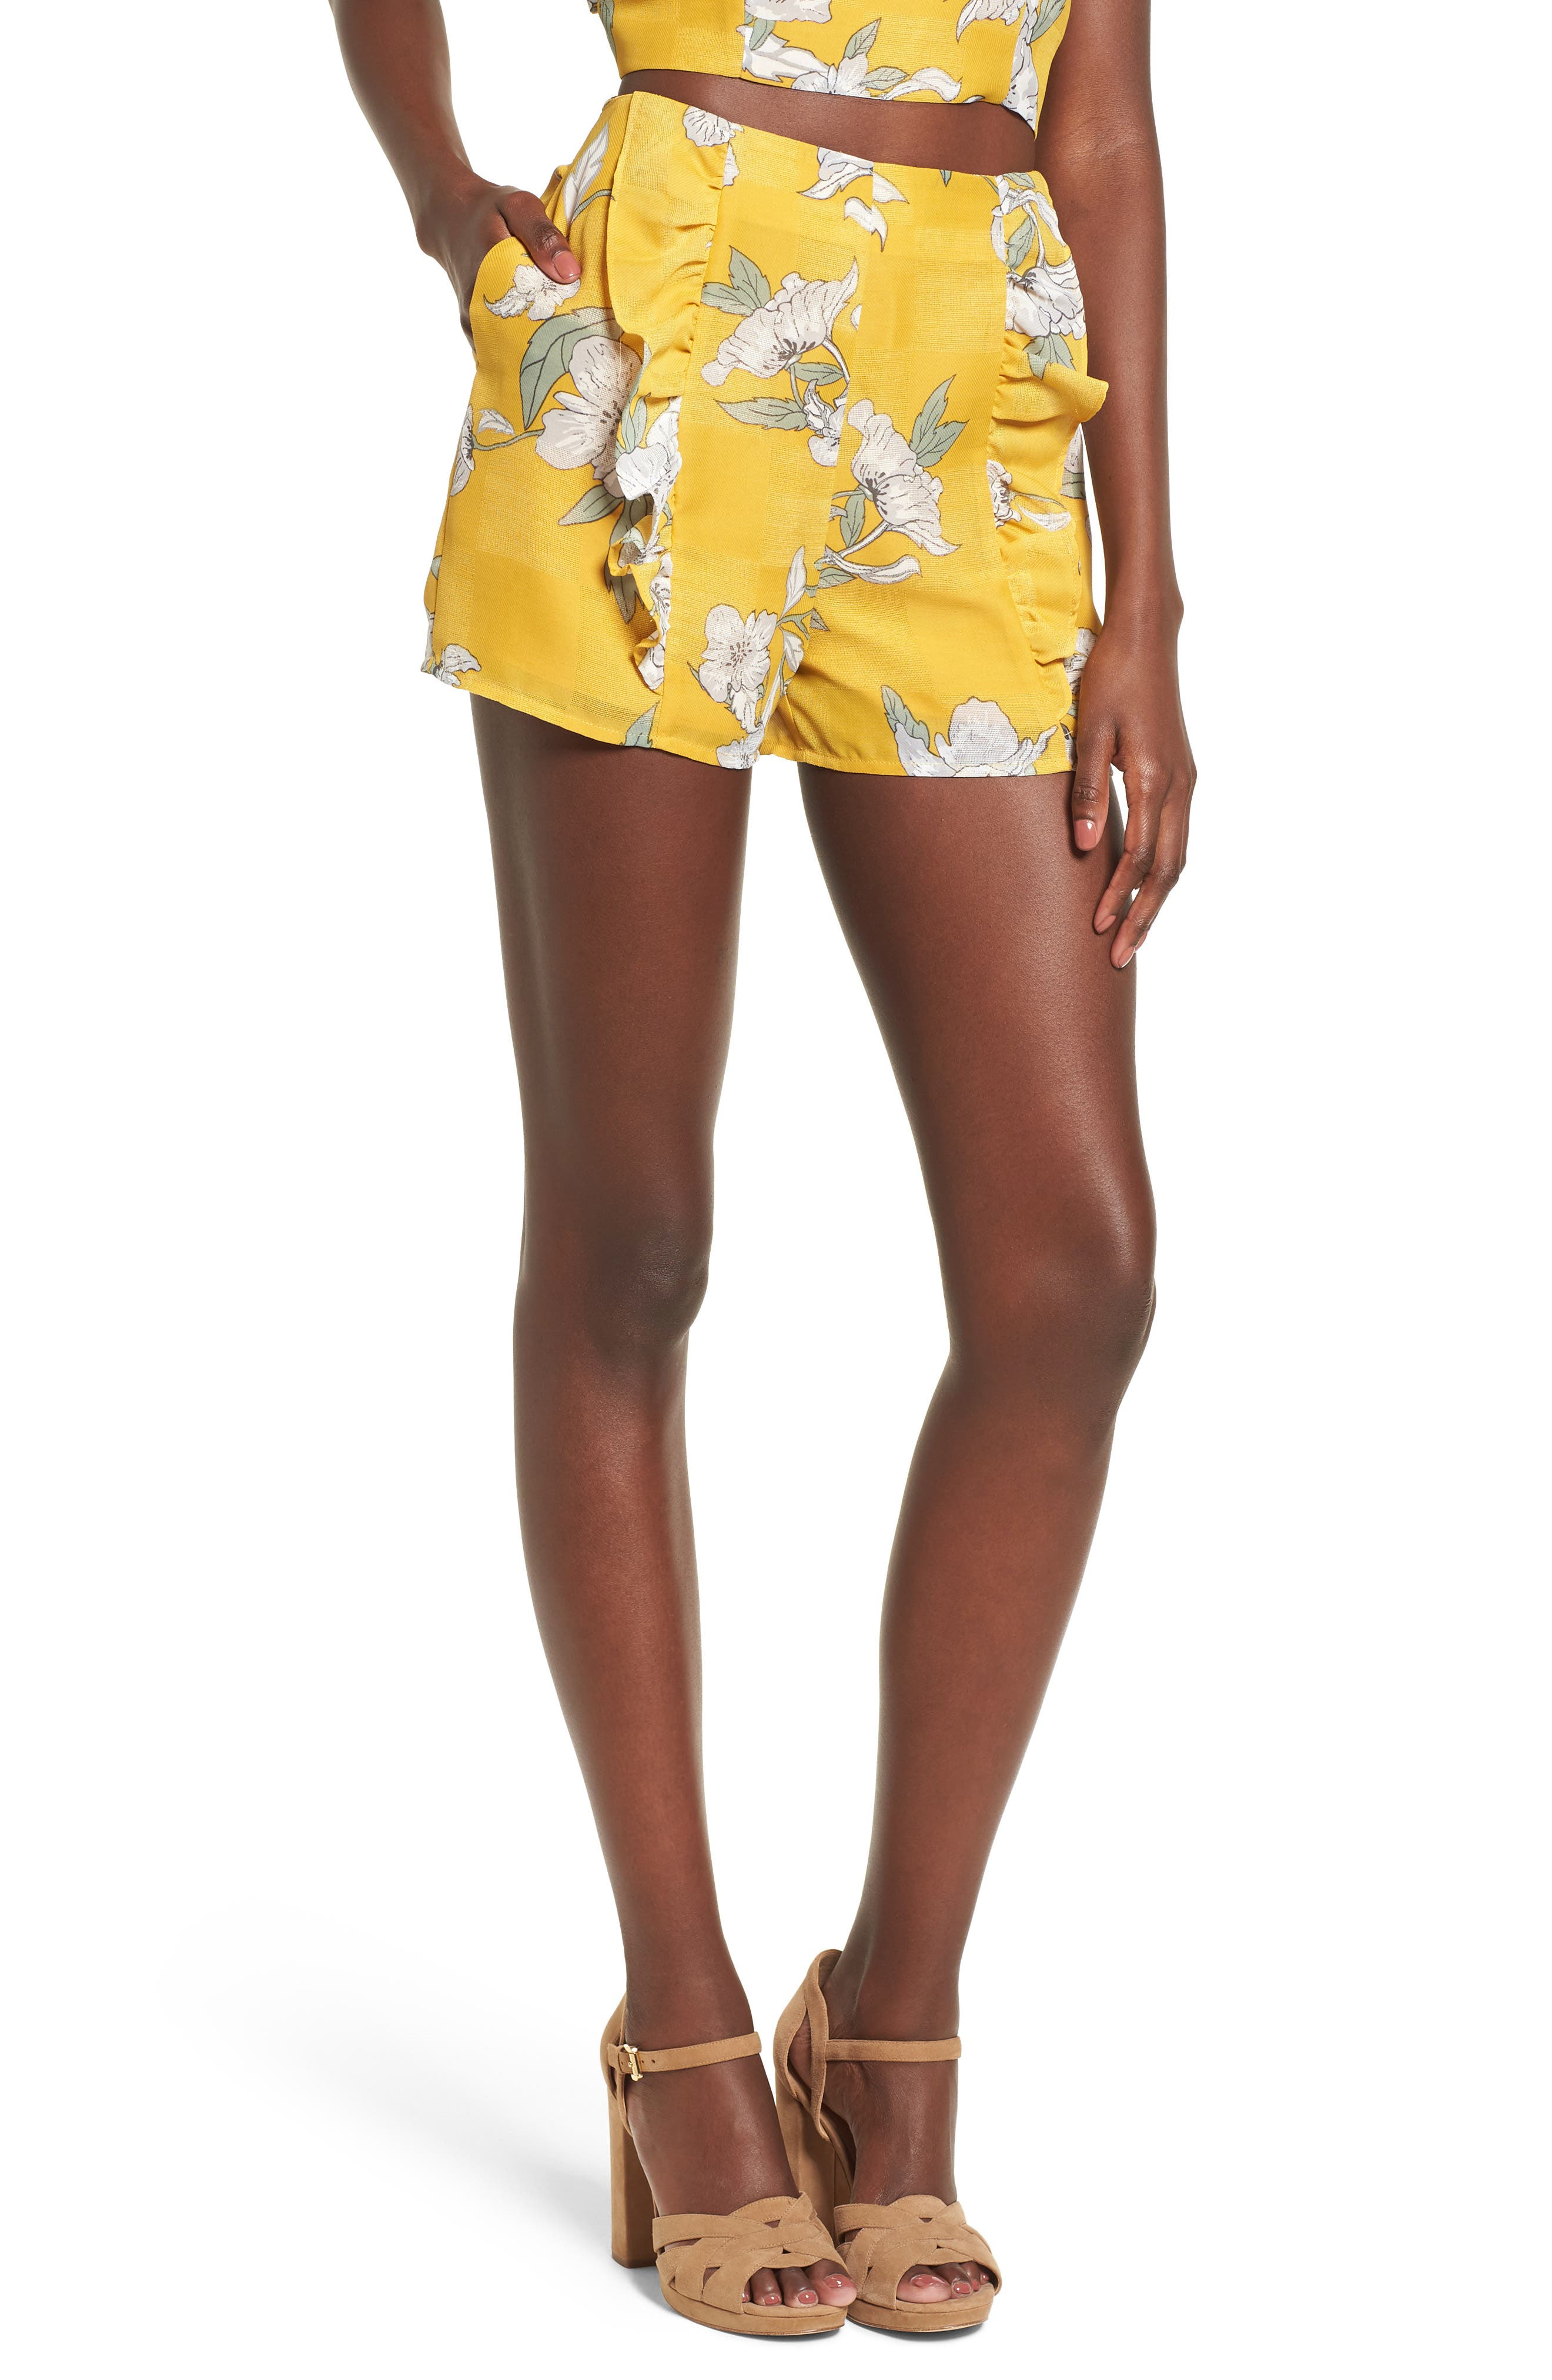 Main Image - Chriselle x J.O.A. Ruffle Front High Waist Shorts